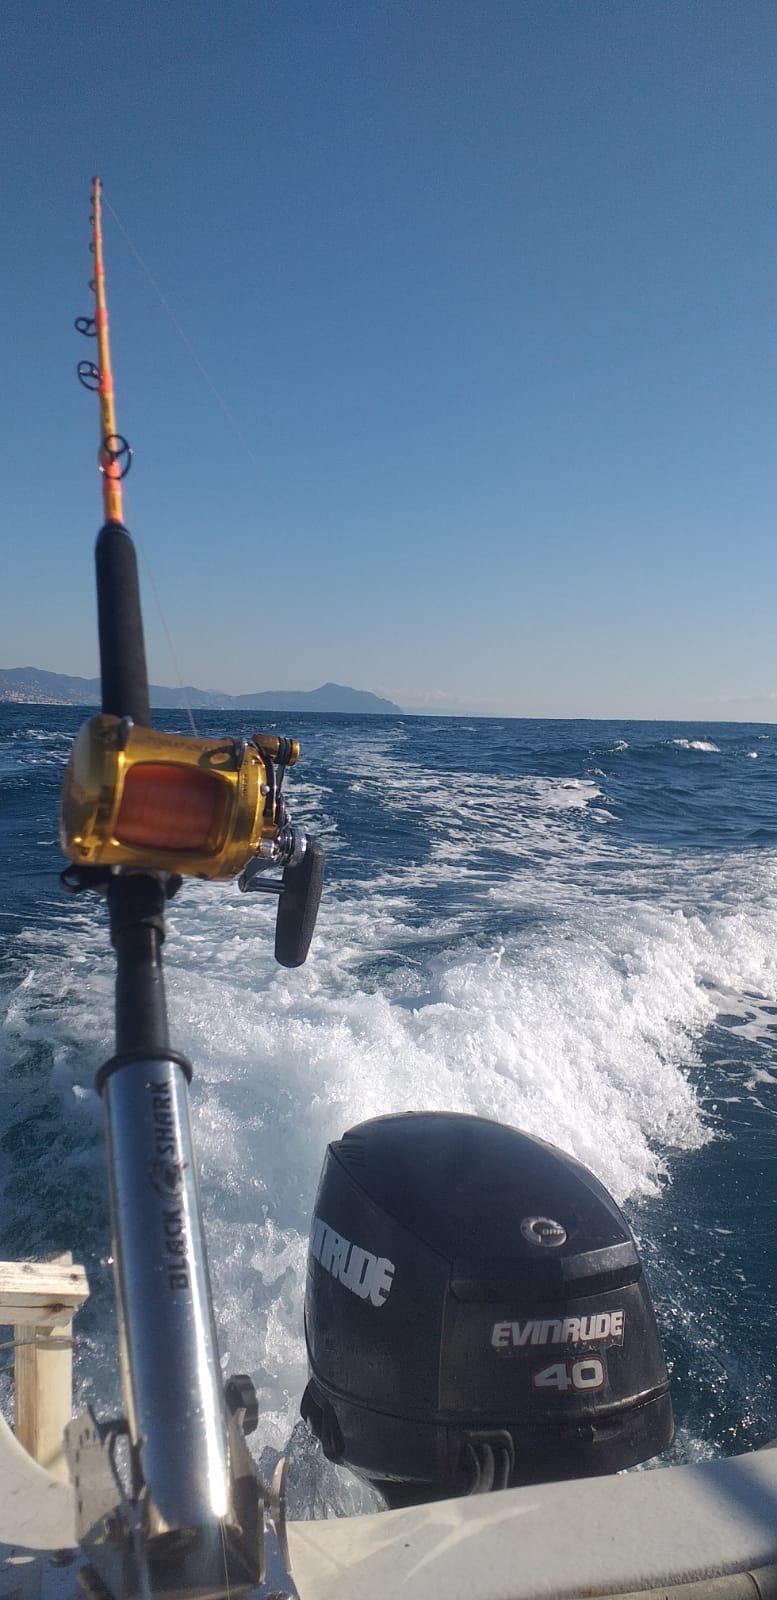 Portacanna Black Shark su Imbarcazione